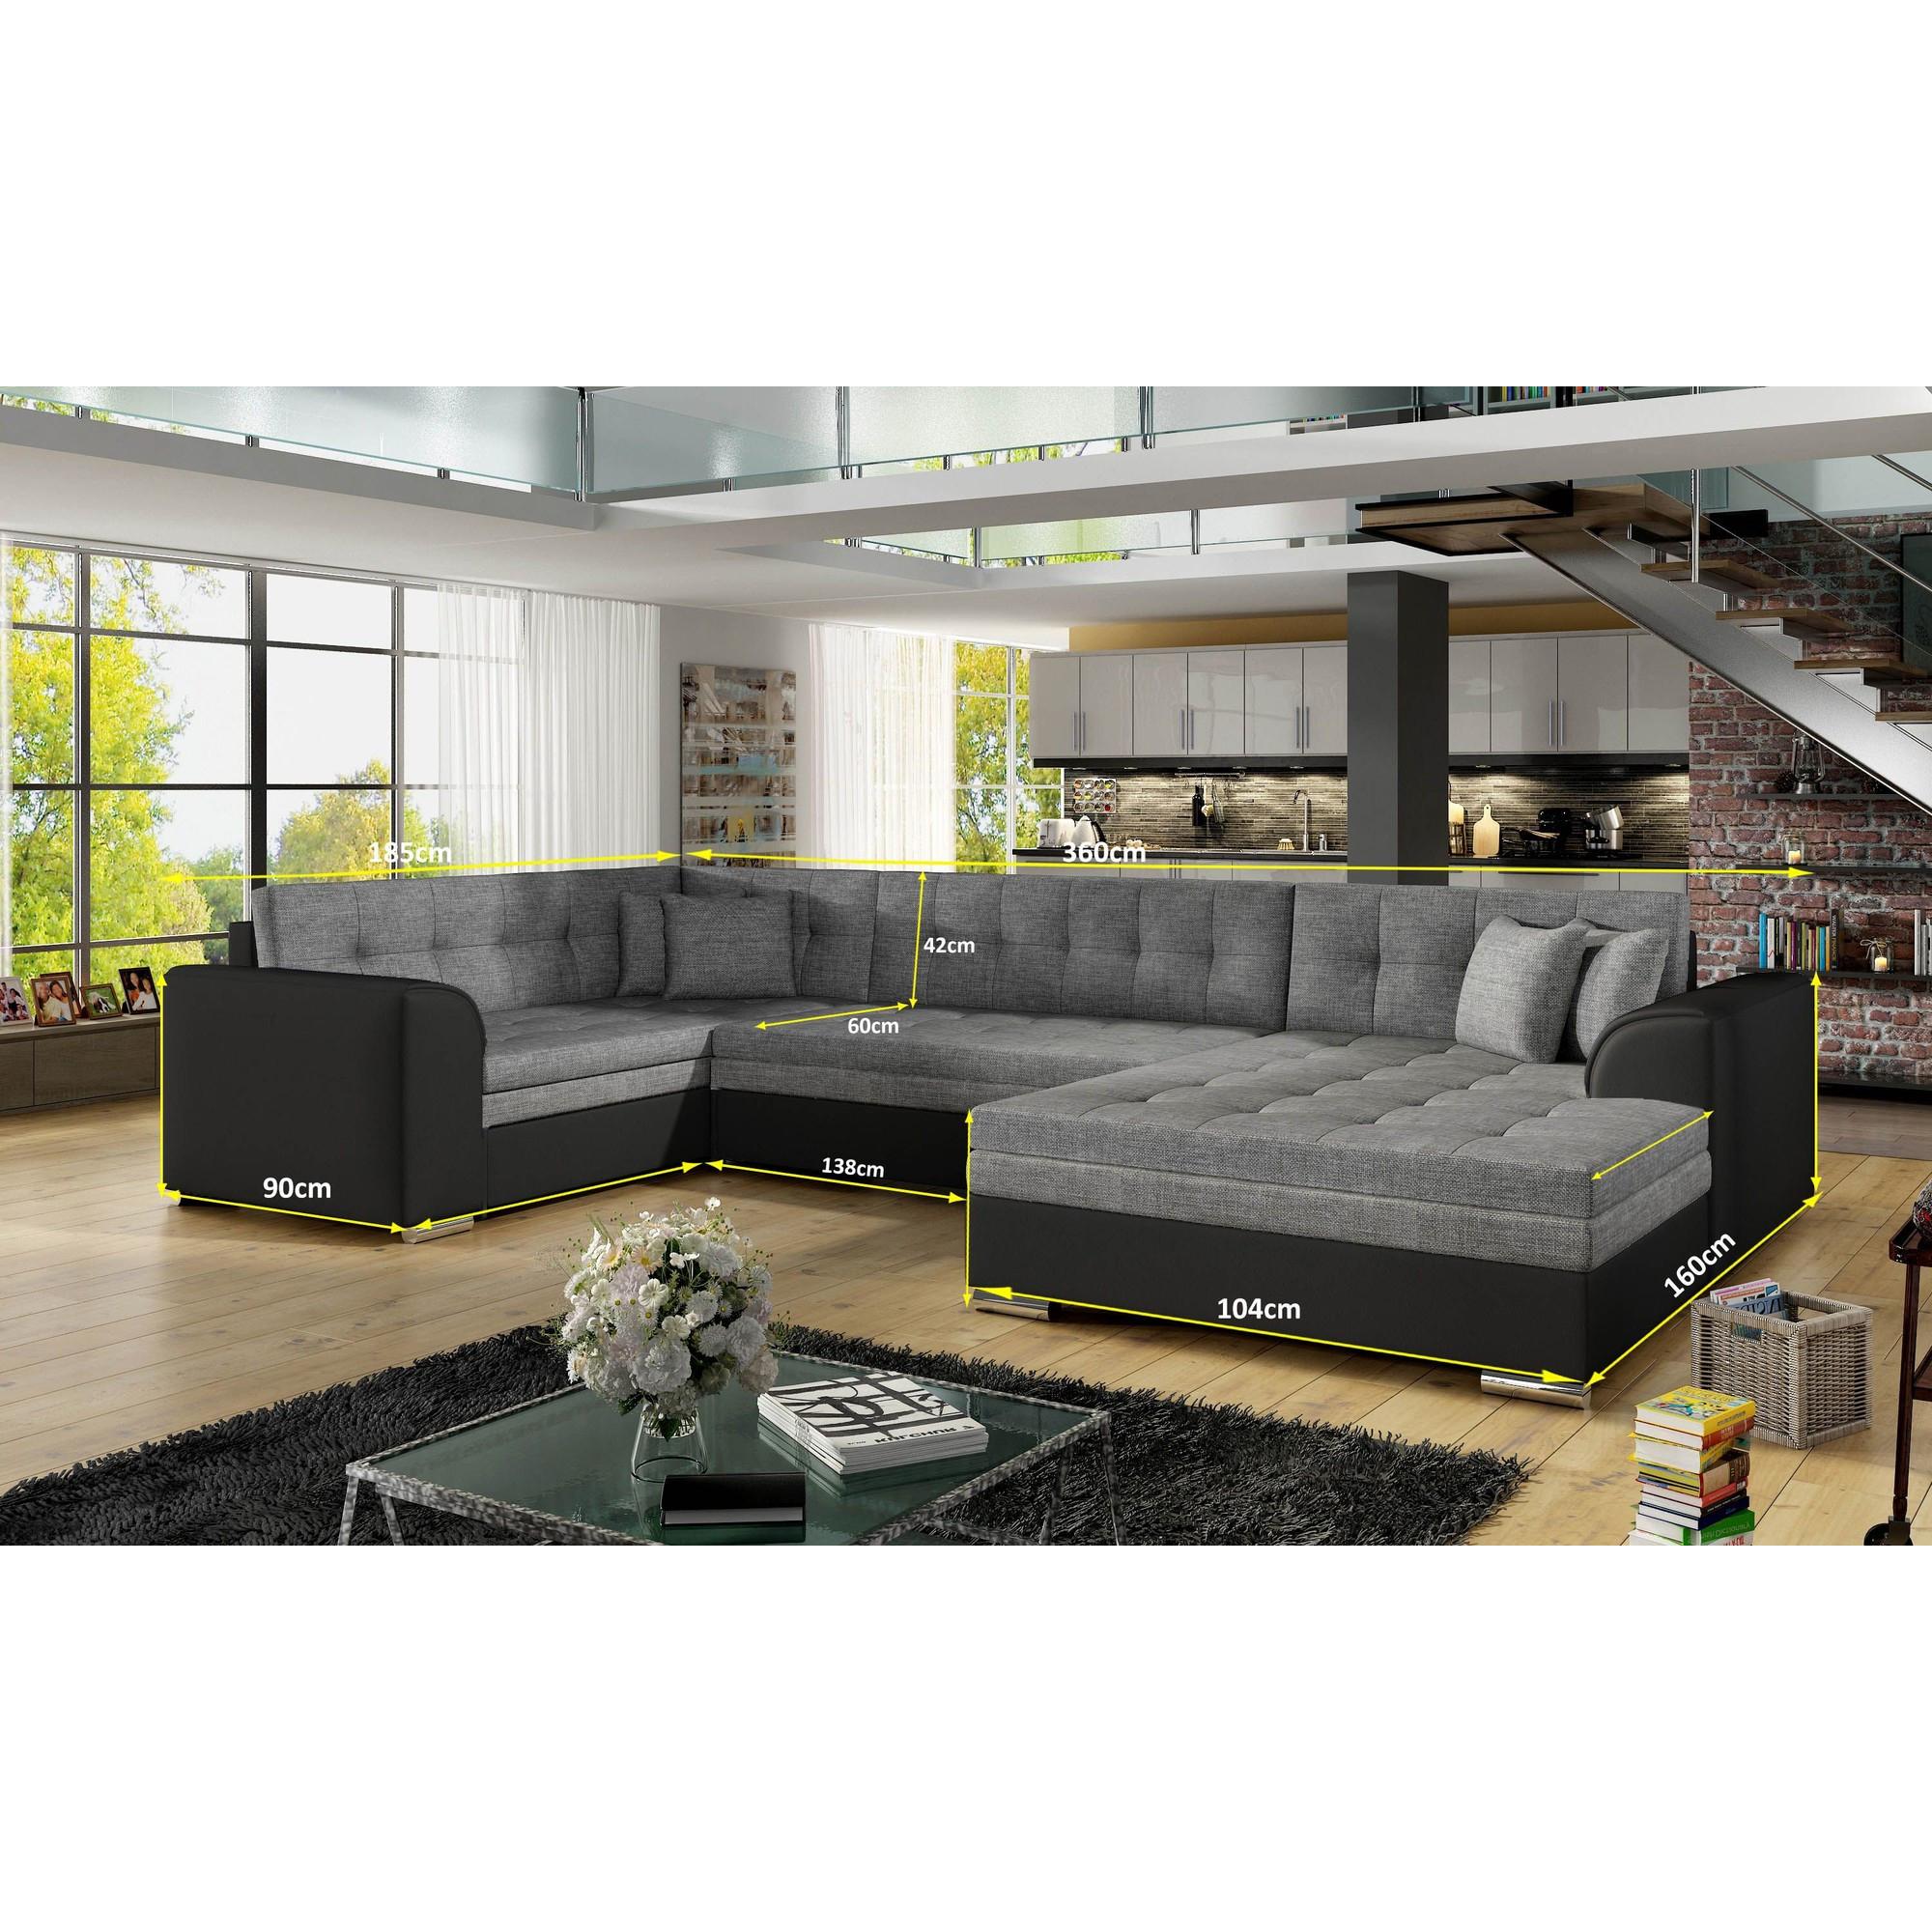 Canapé d angle convertible 6 places en tissu bleu marine